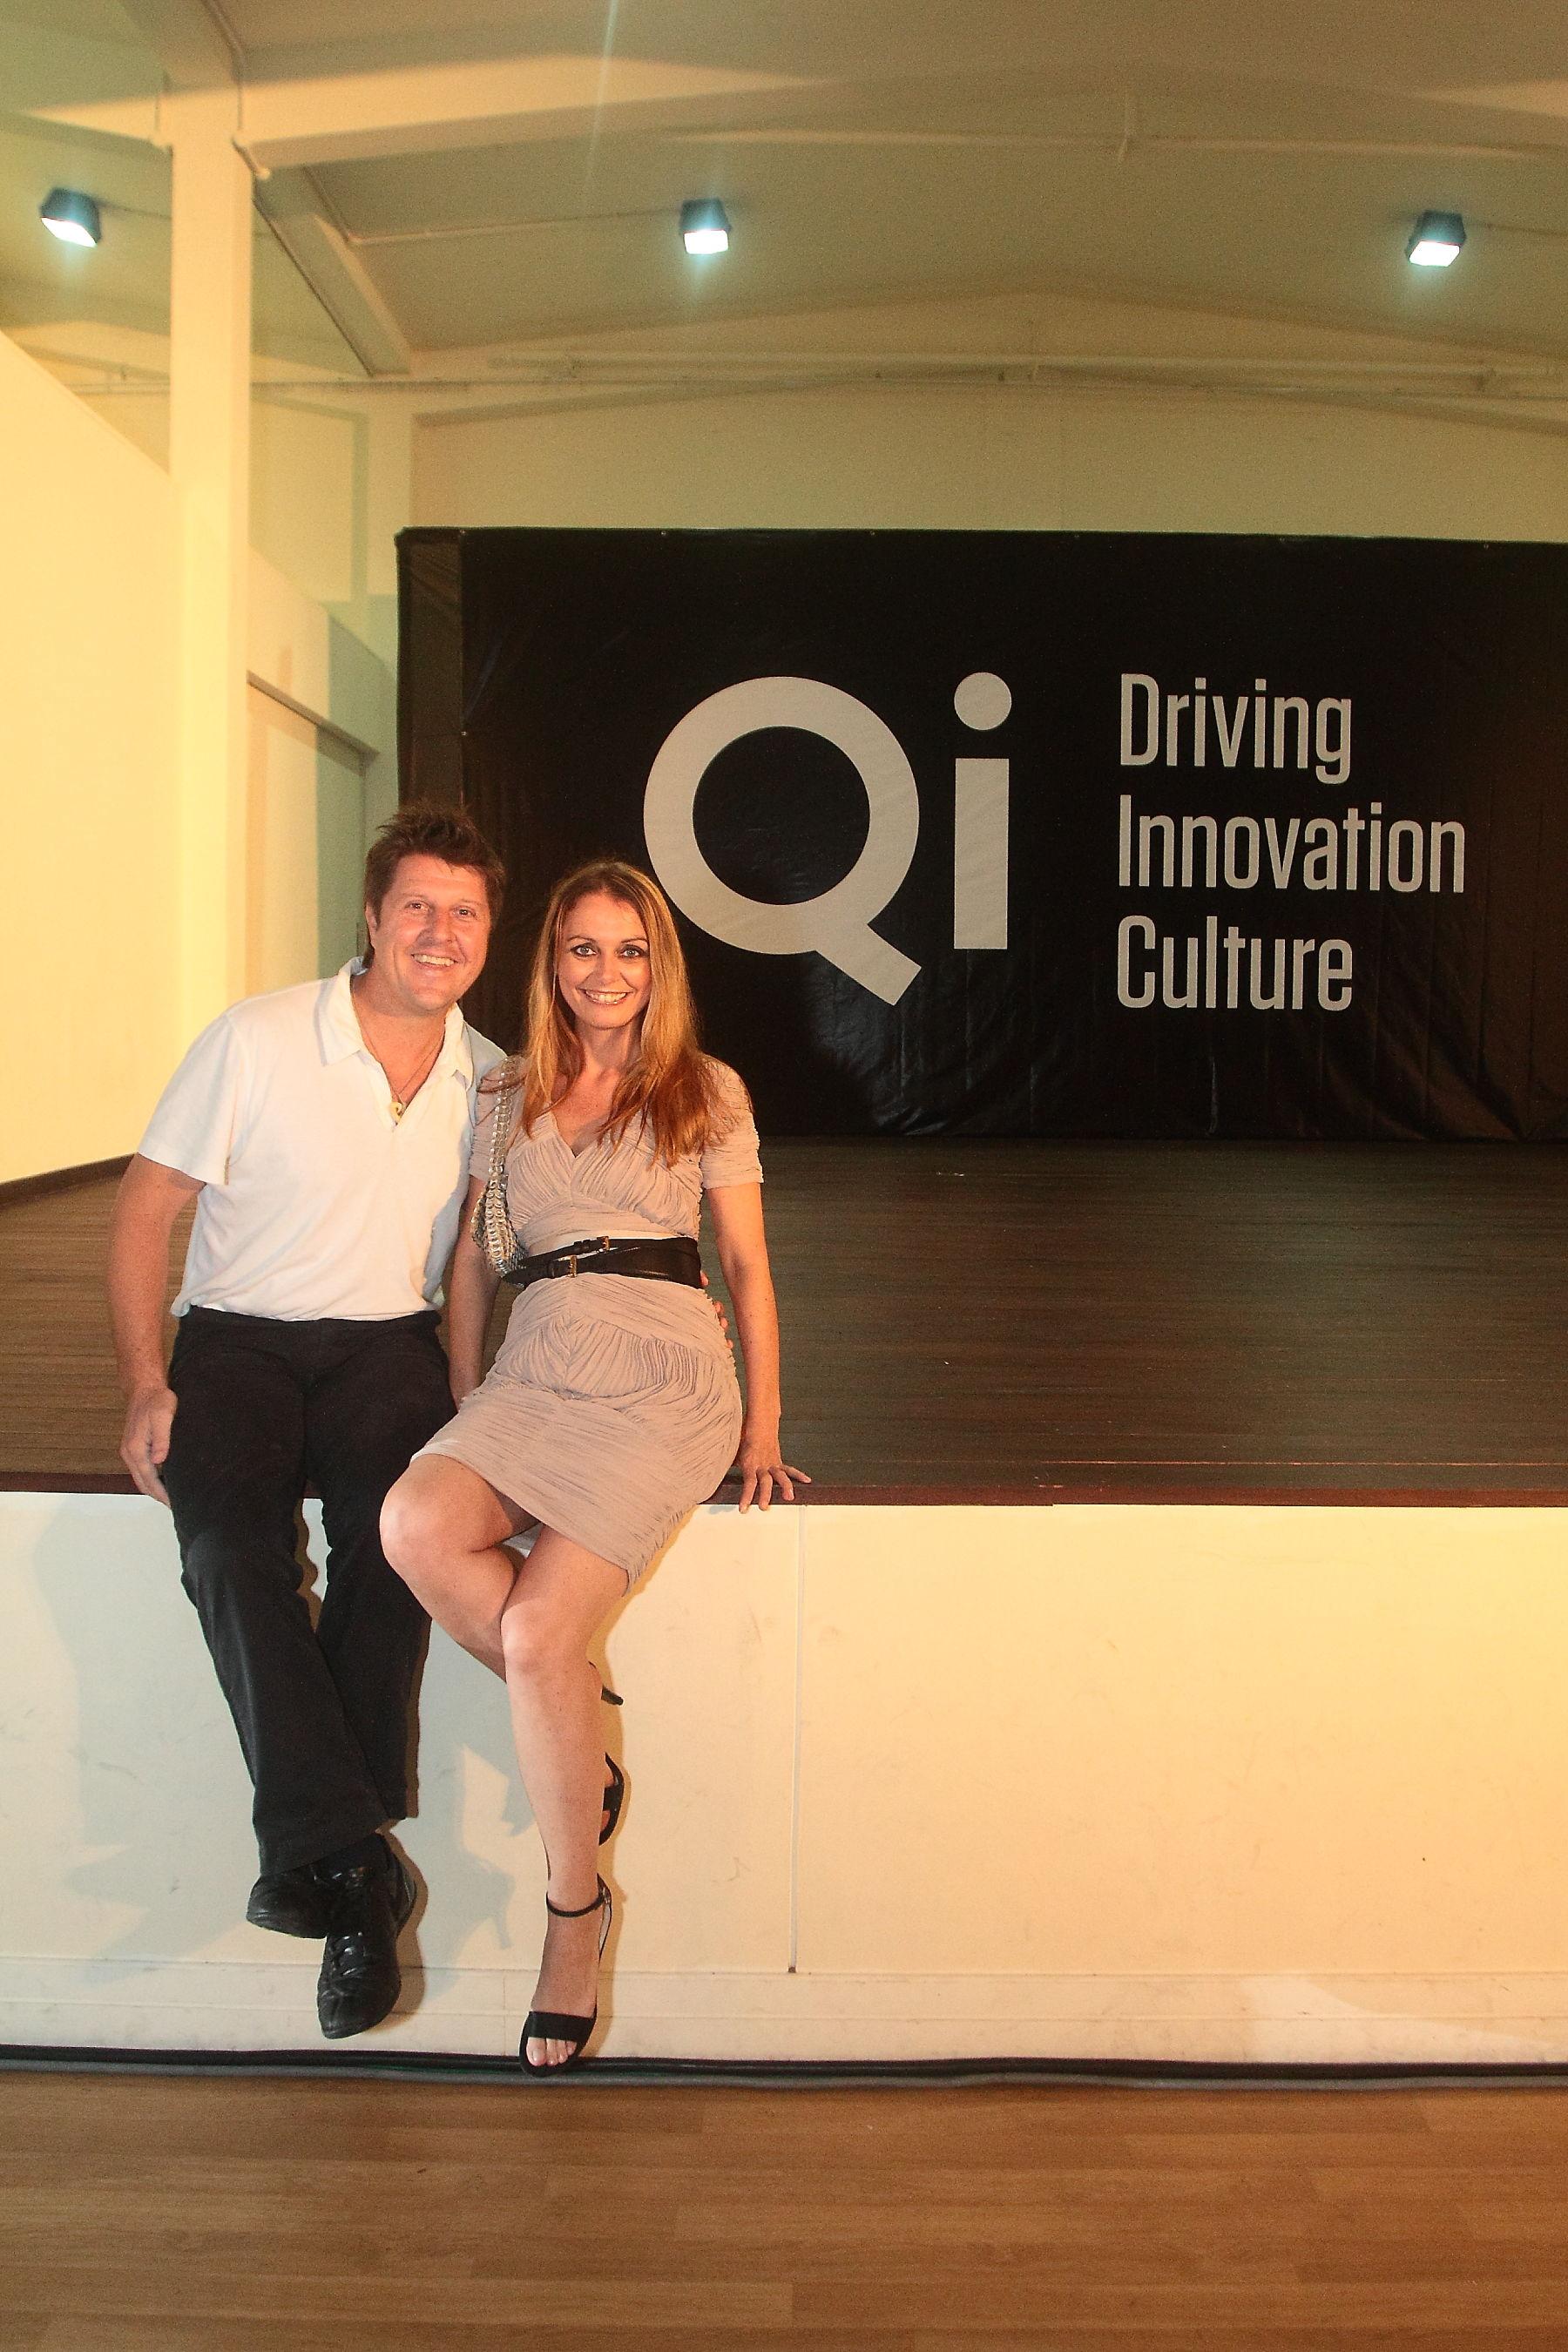 qi-global-2011-driving-innovation-culture-009.jpg